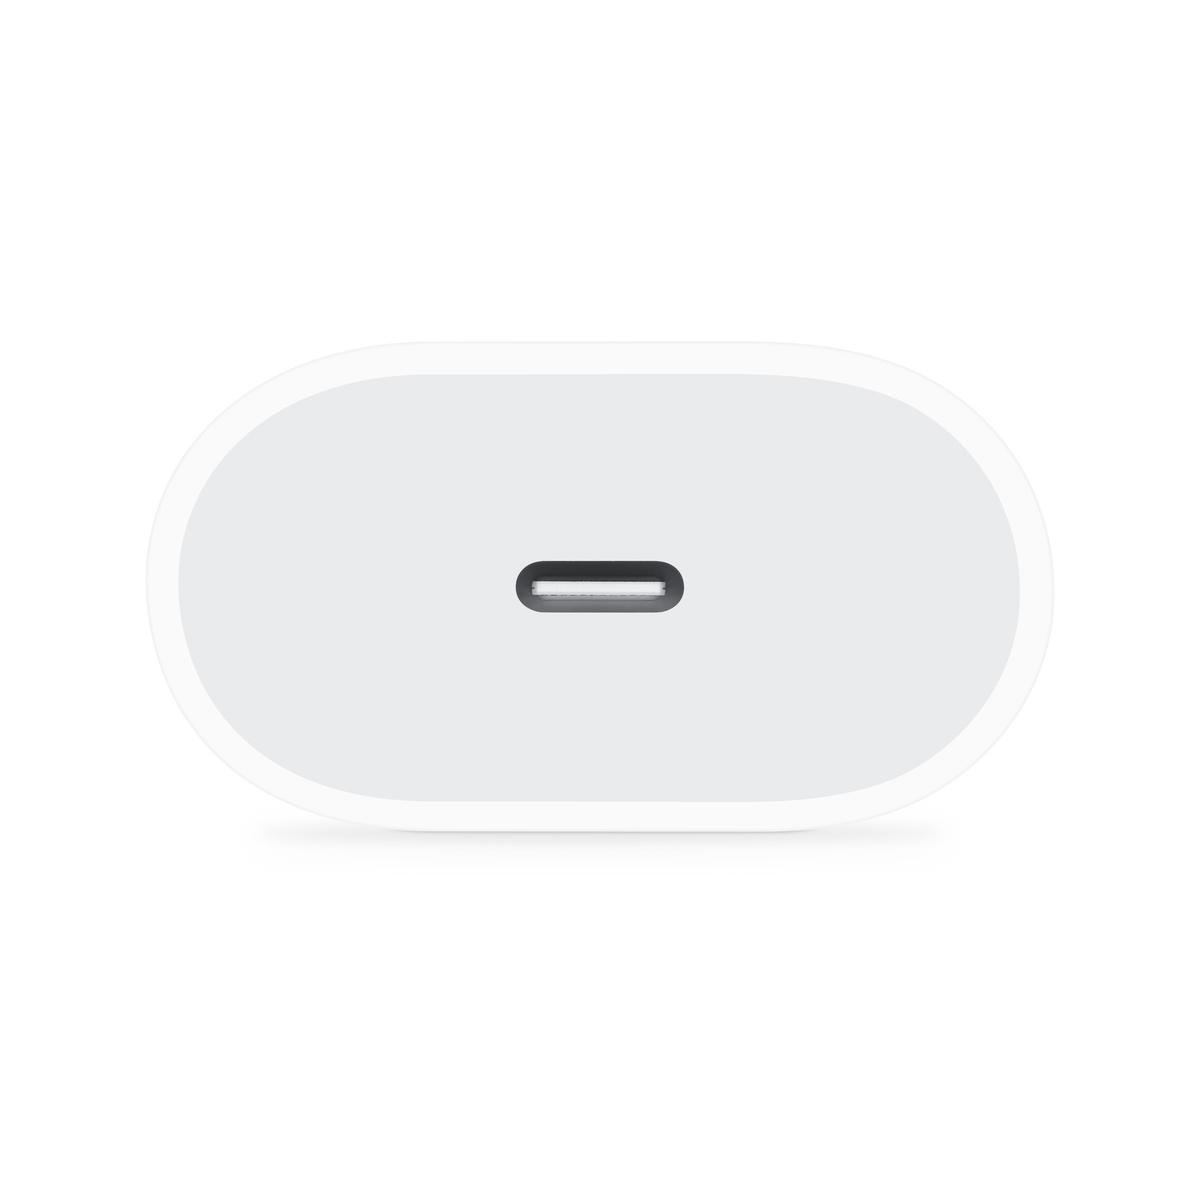 Carregador Apple  Usb-c 20w PD Fast Charger